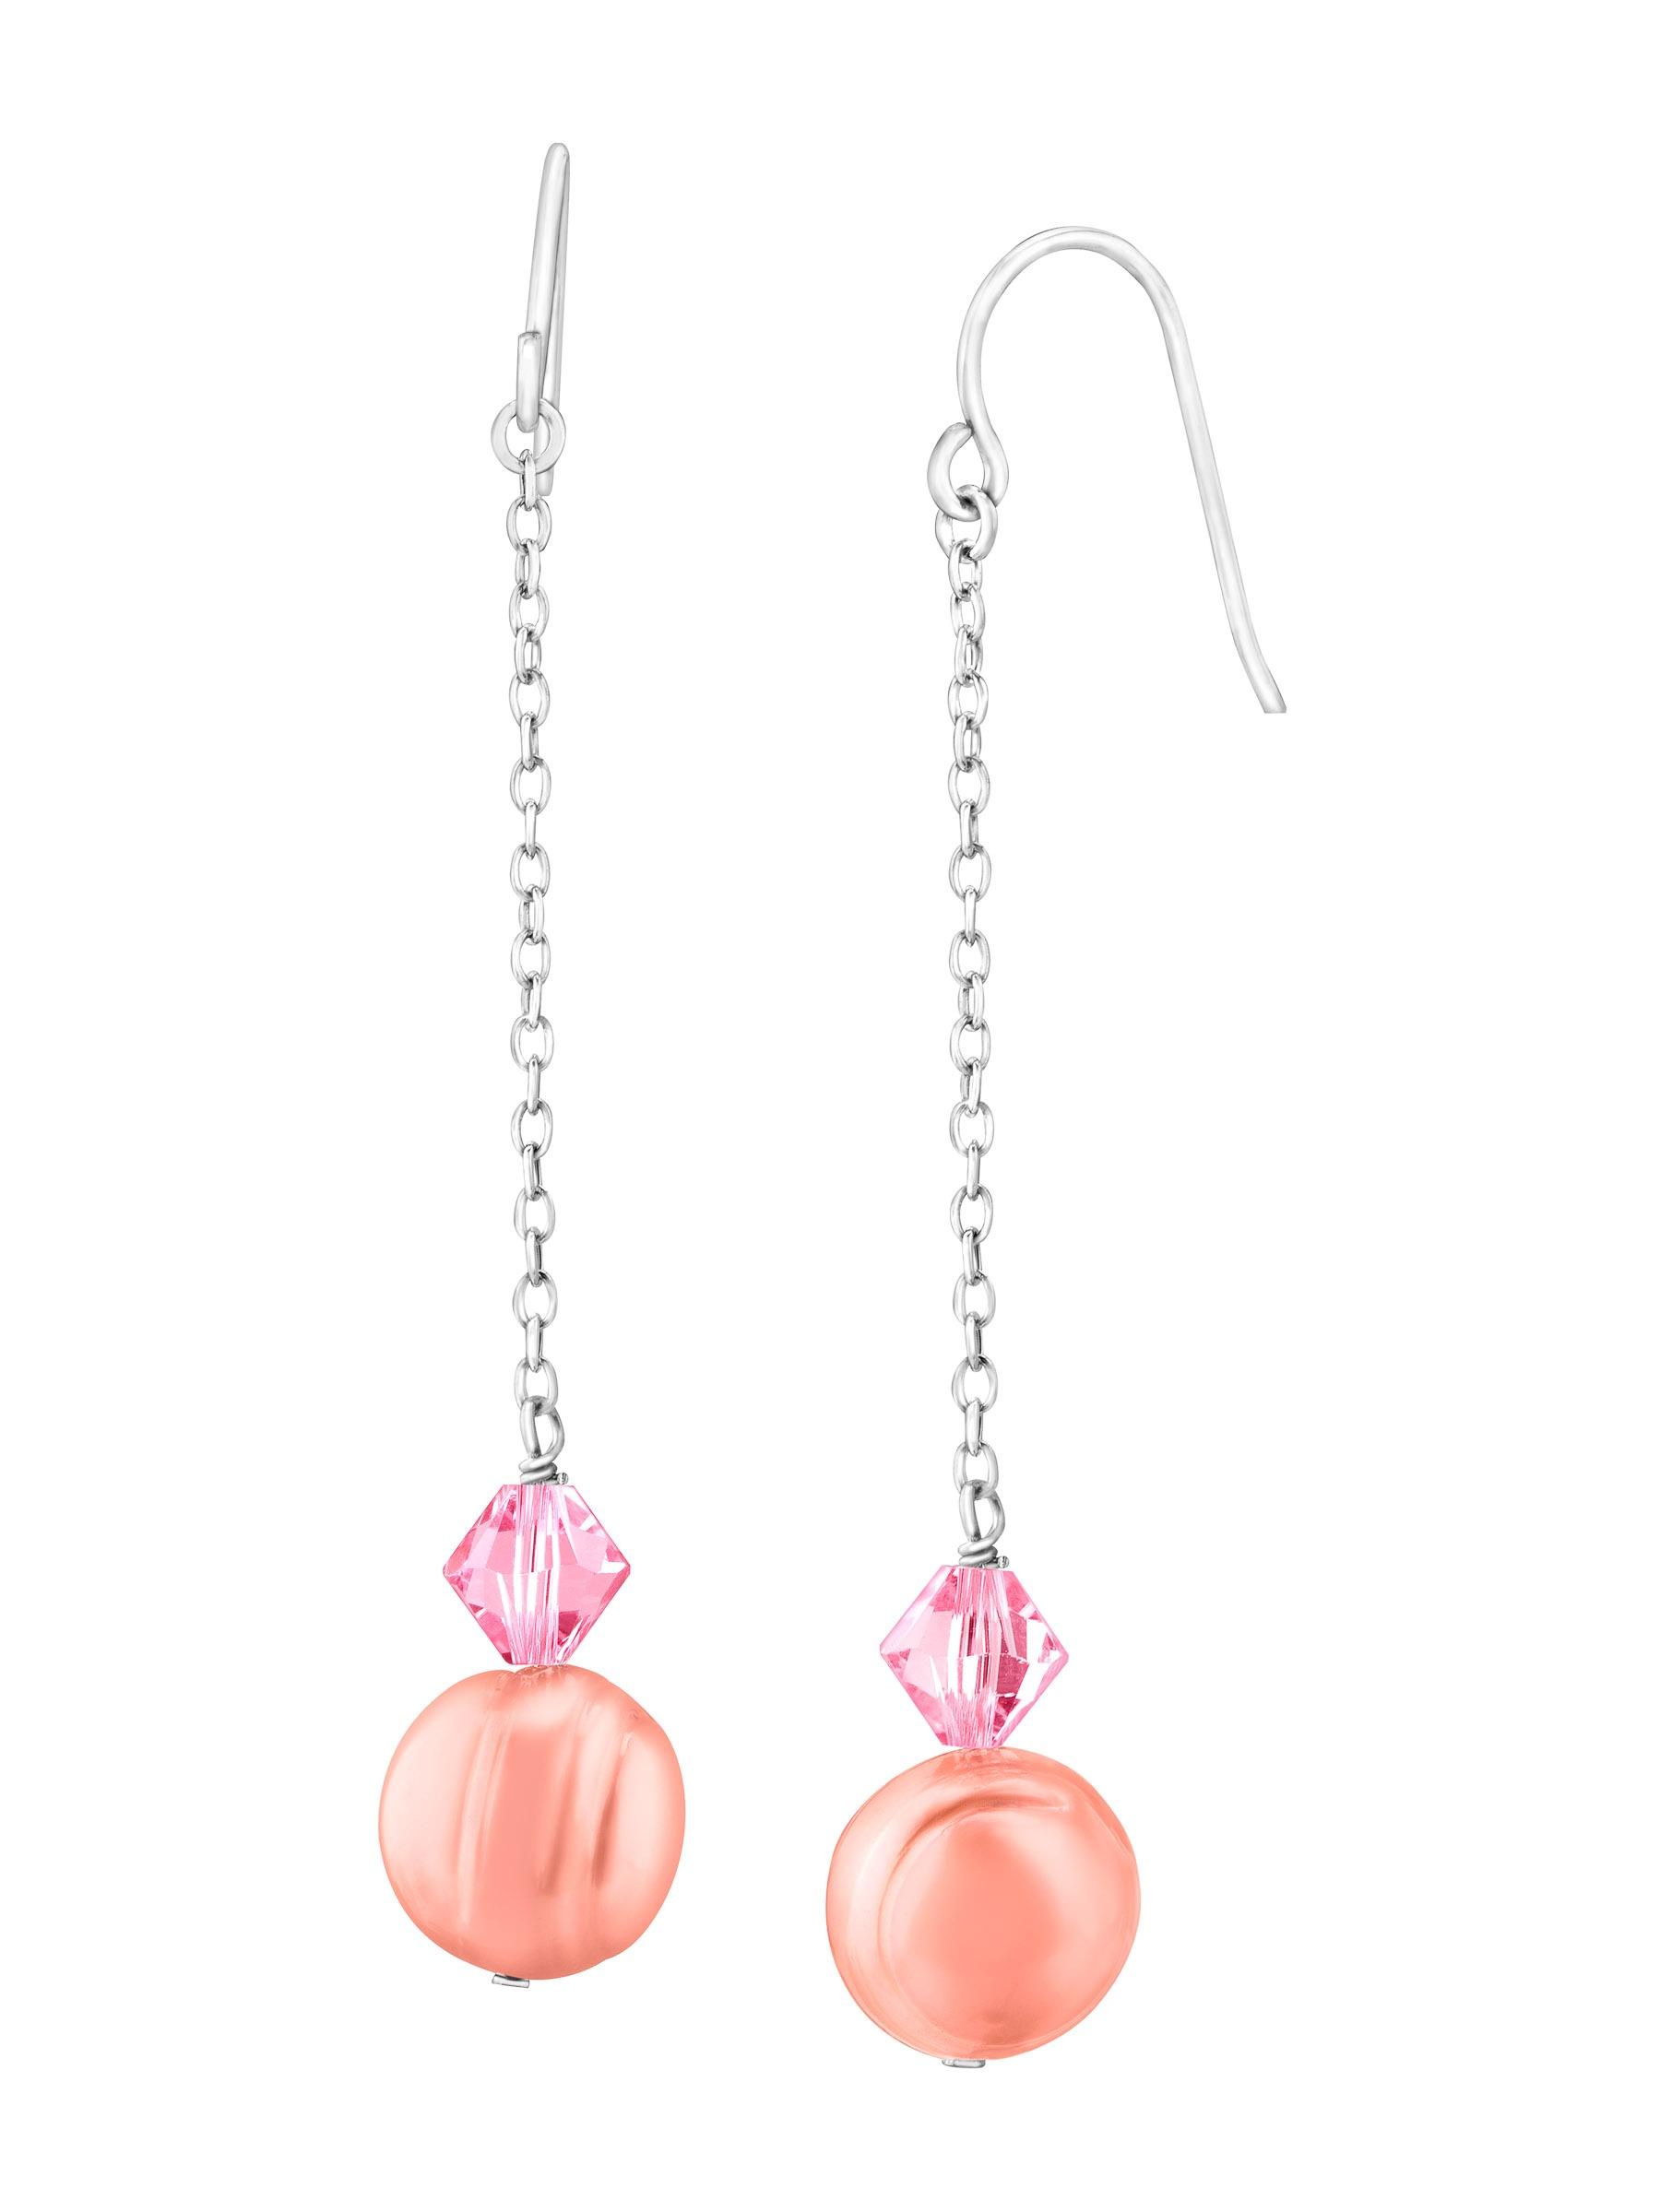 Honora Raspberry Freshwater Pearl Drop Earrings with Swarovski Crystals in Sterling Silver